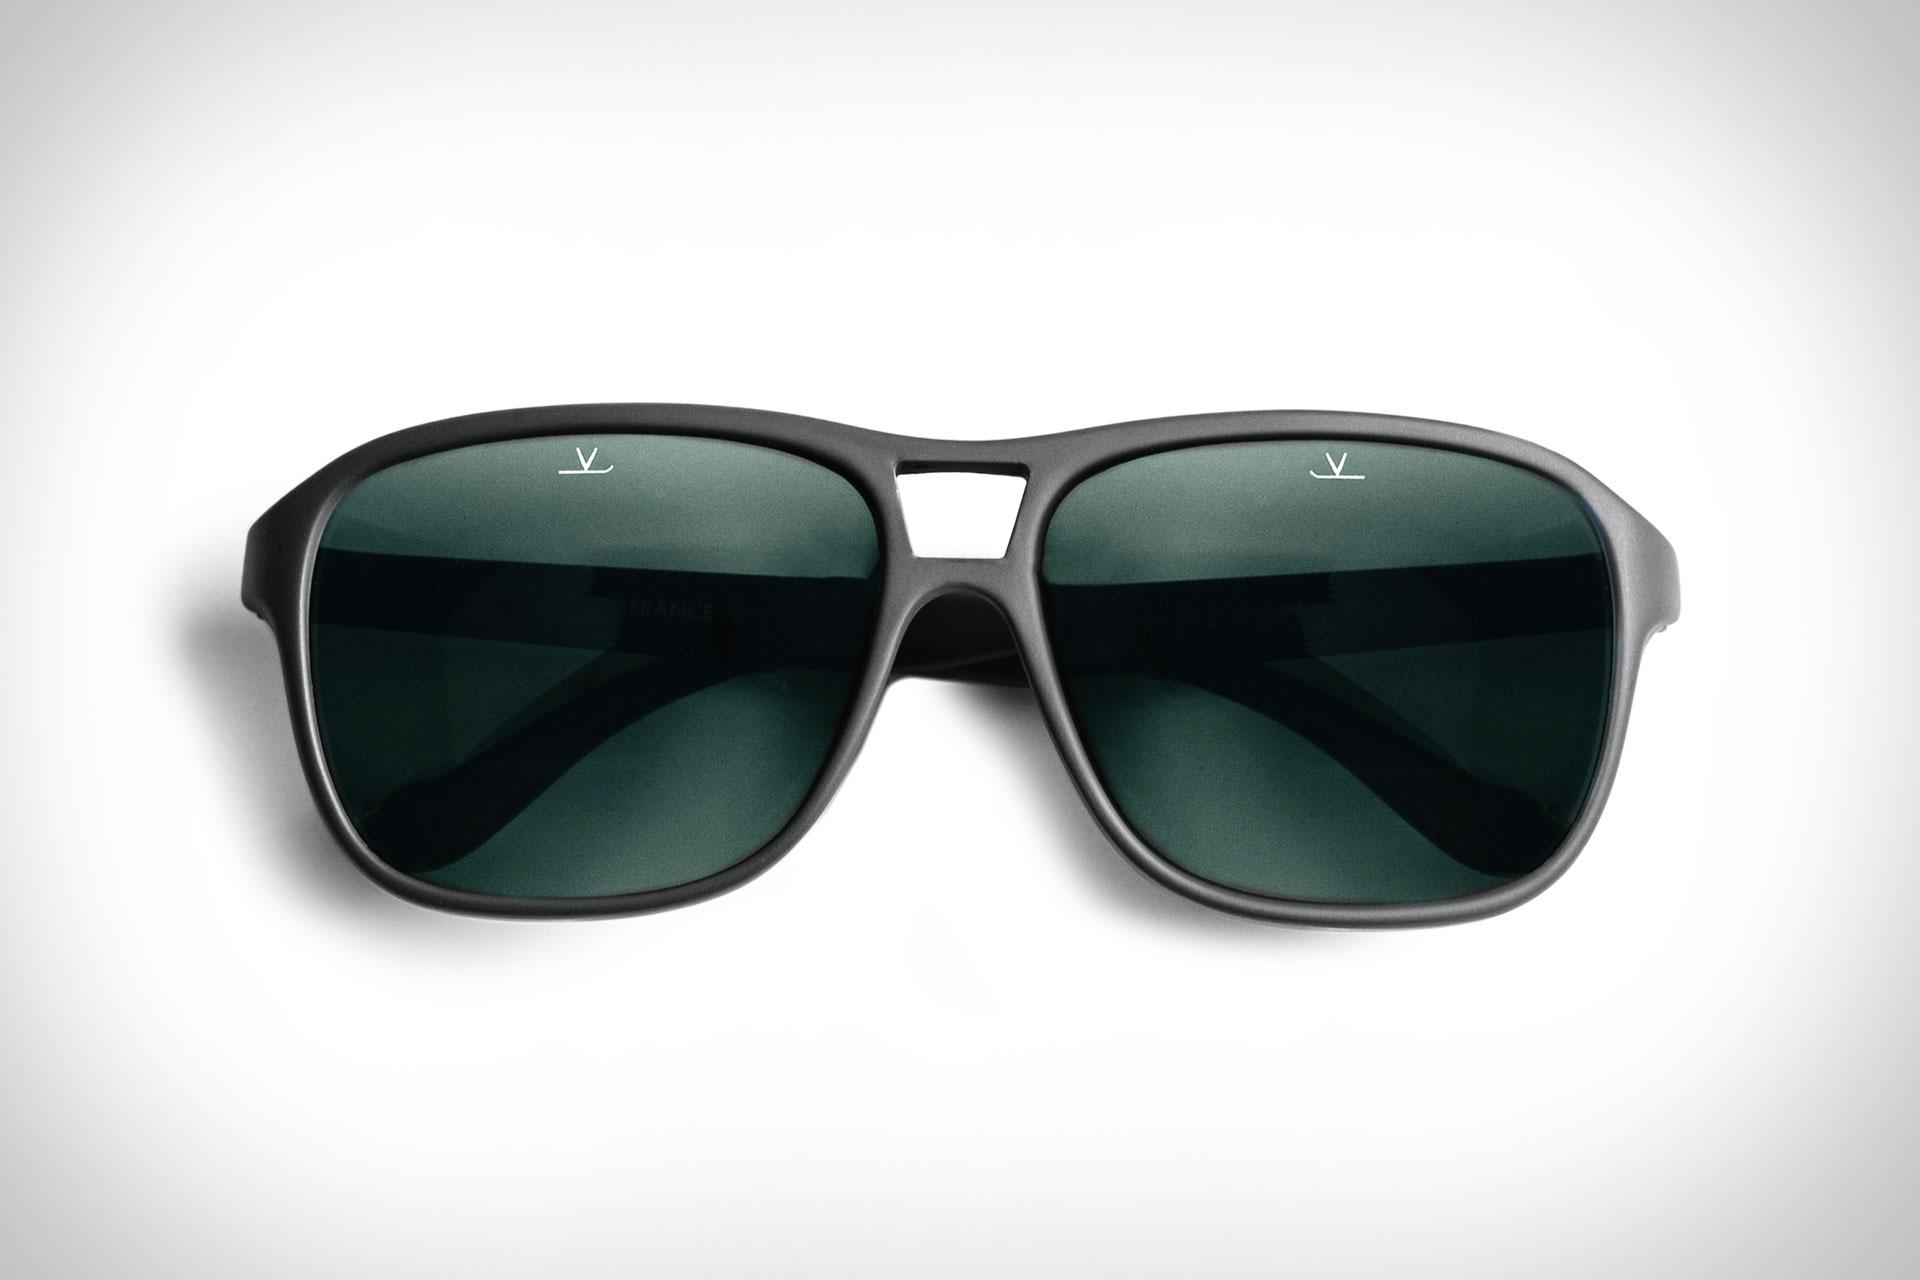 7566a0302 Vuarnet The Dude Sunglasses   Uncrate